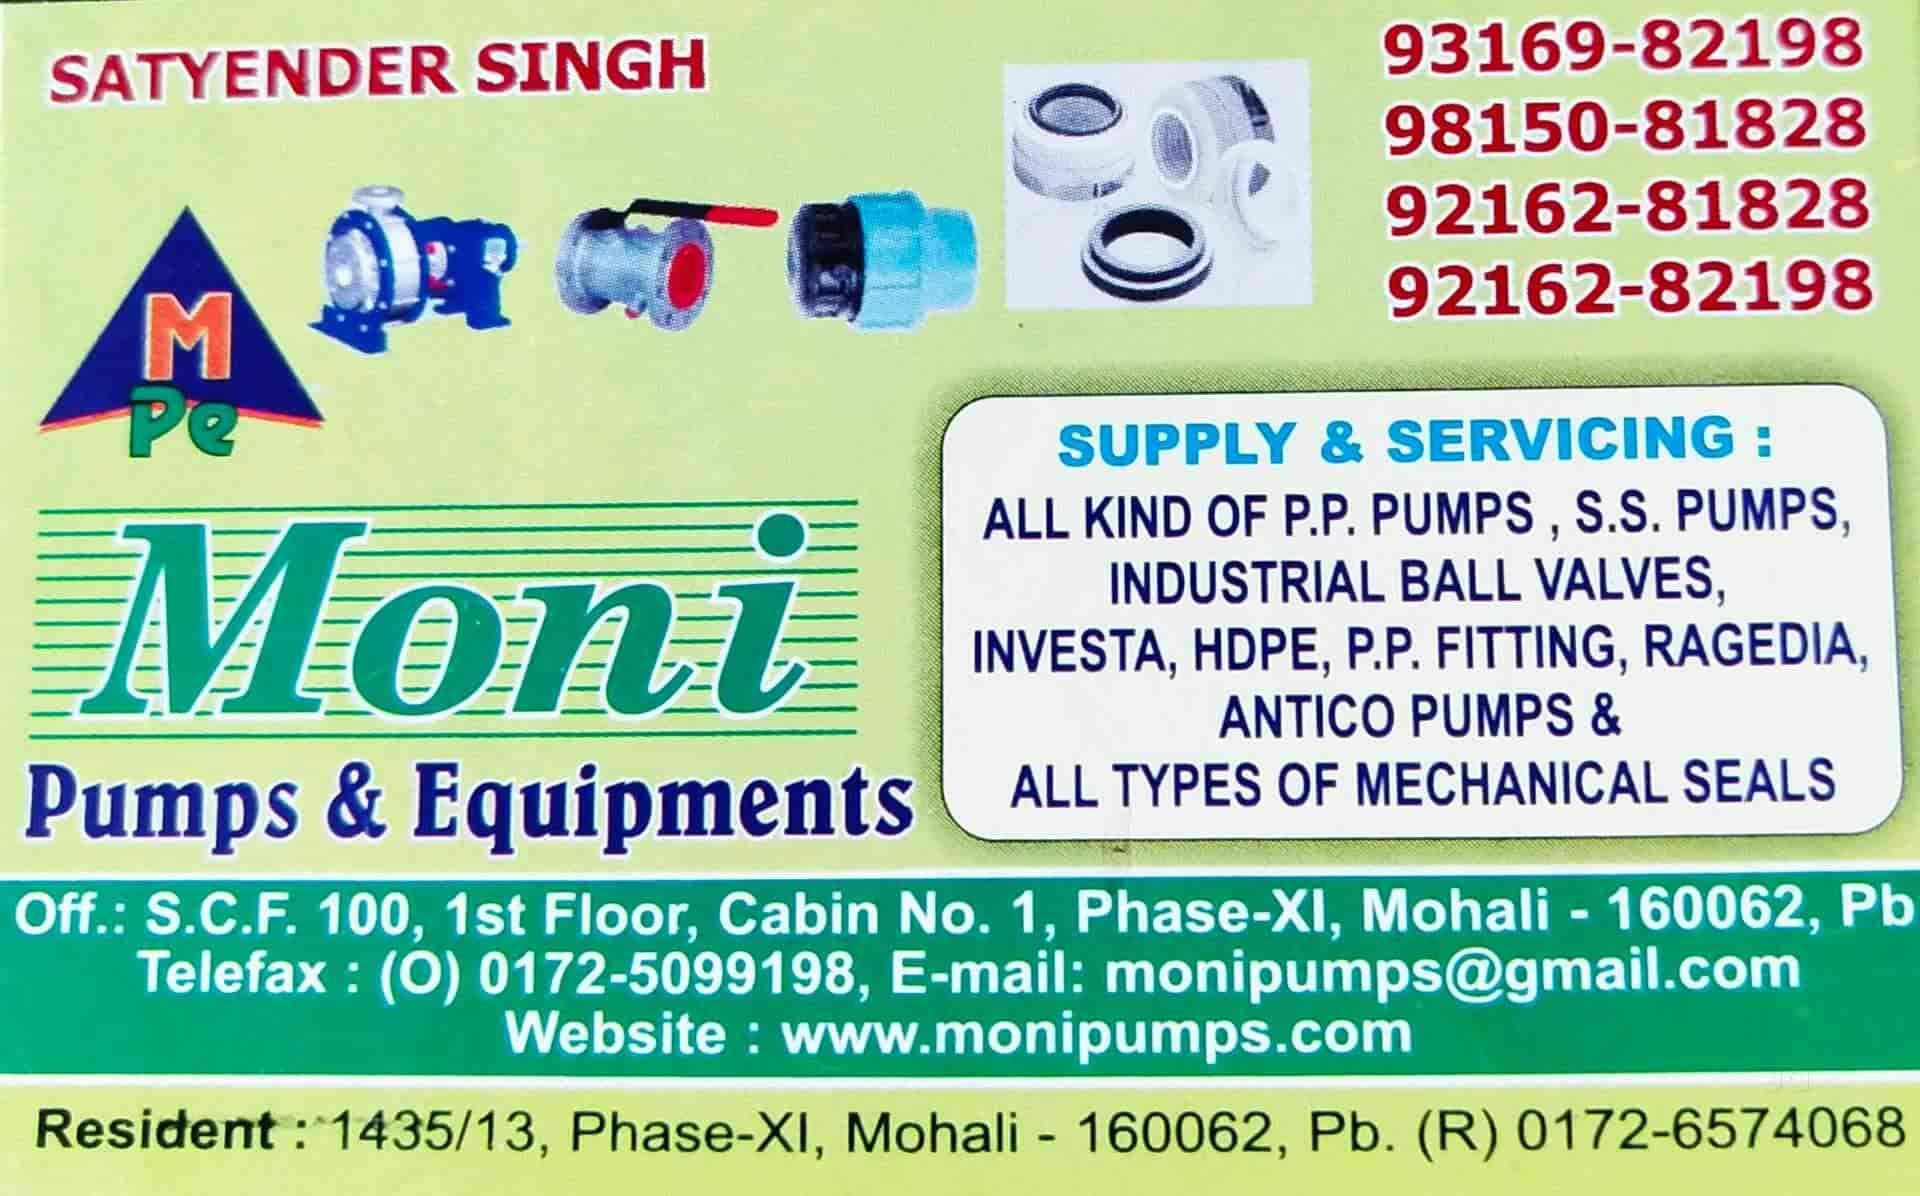 Moni Pumps & Equipment, Chandigarh Sector 65 Phase 11 - Pump